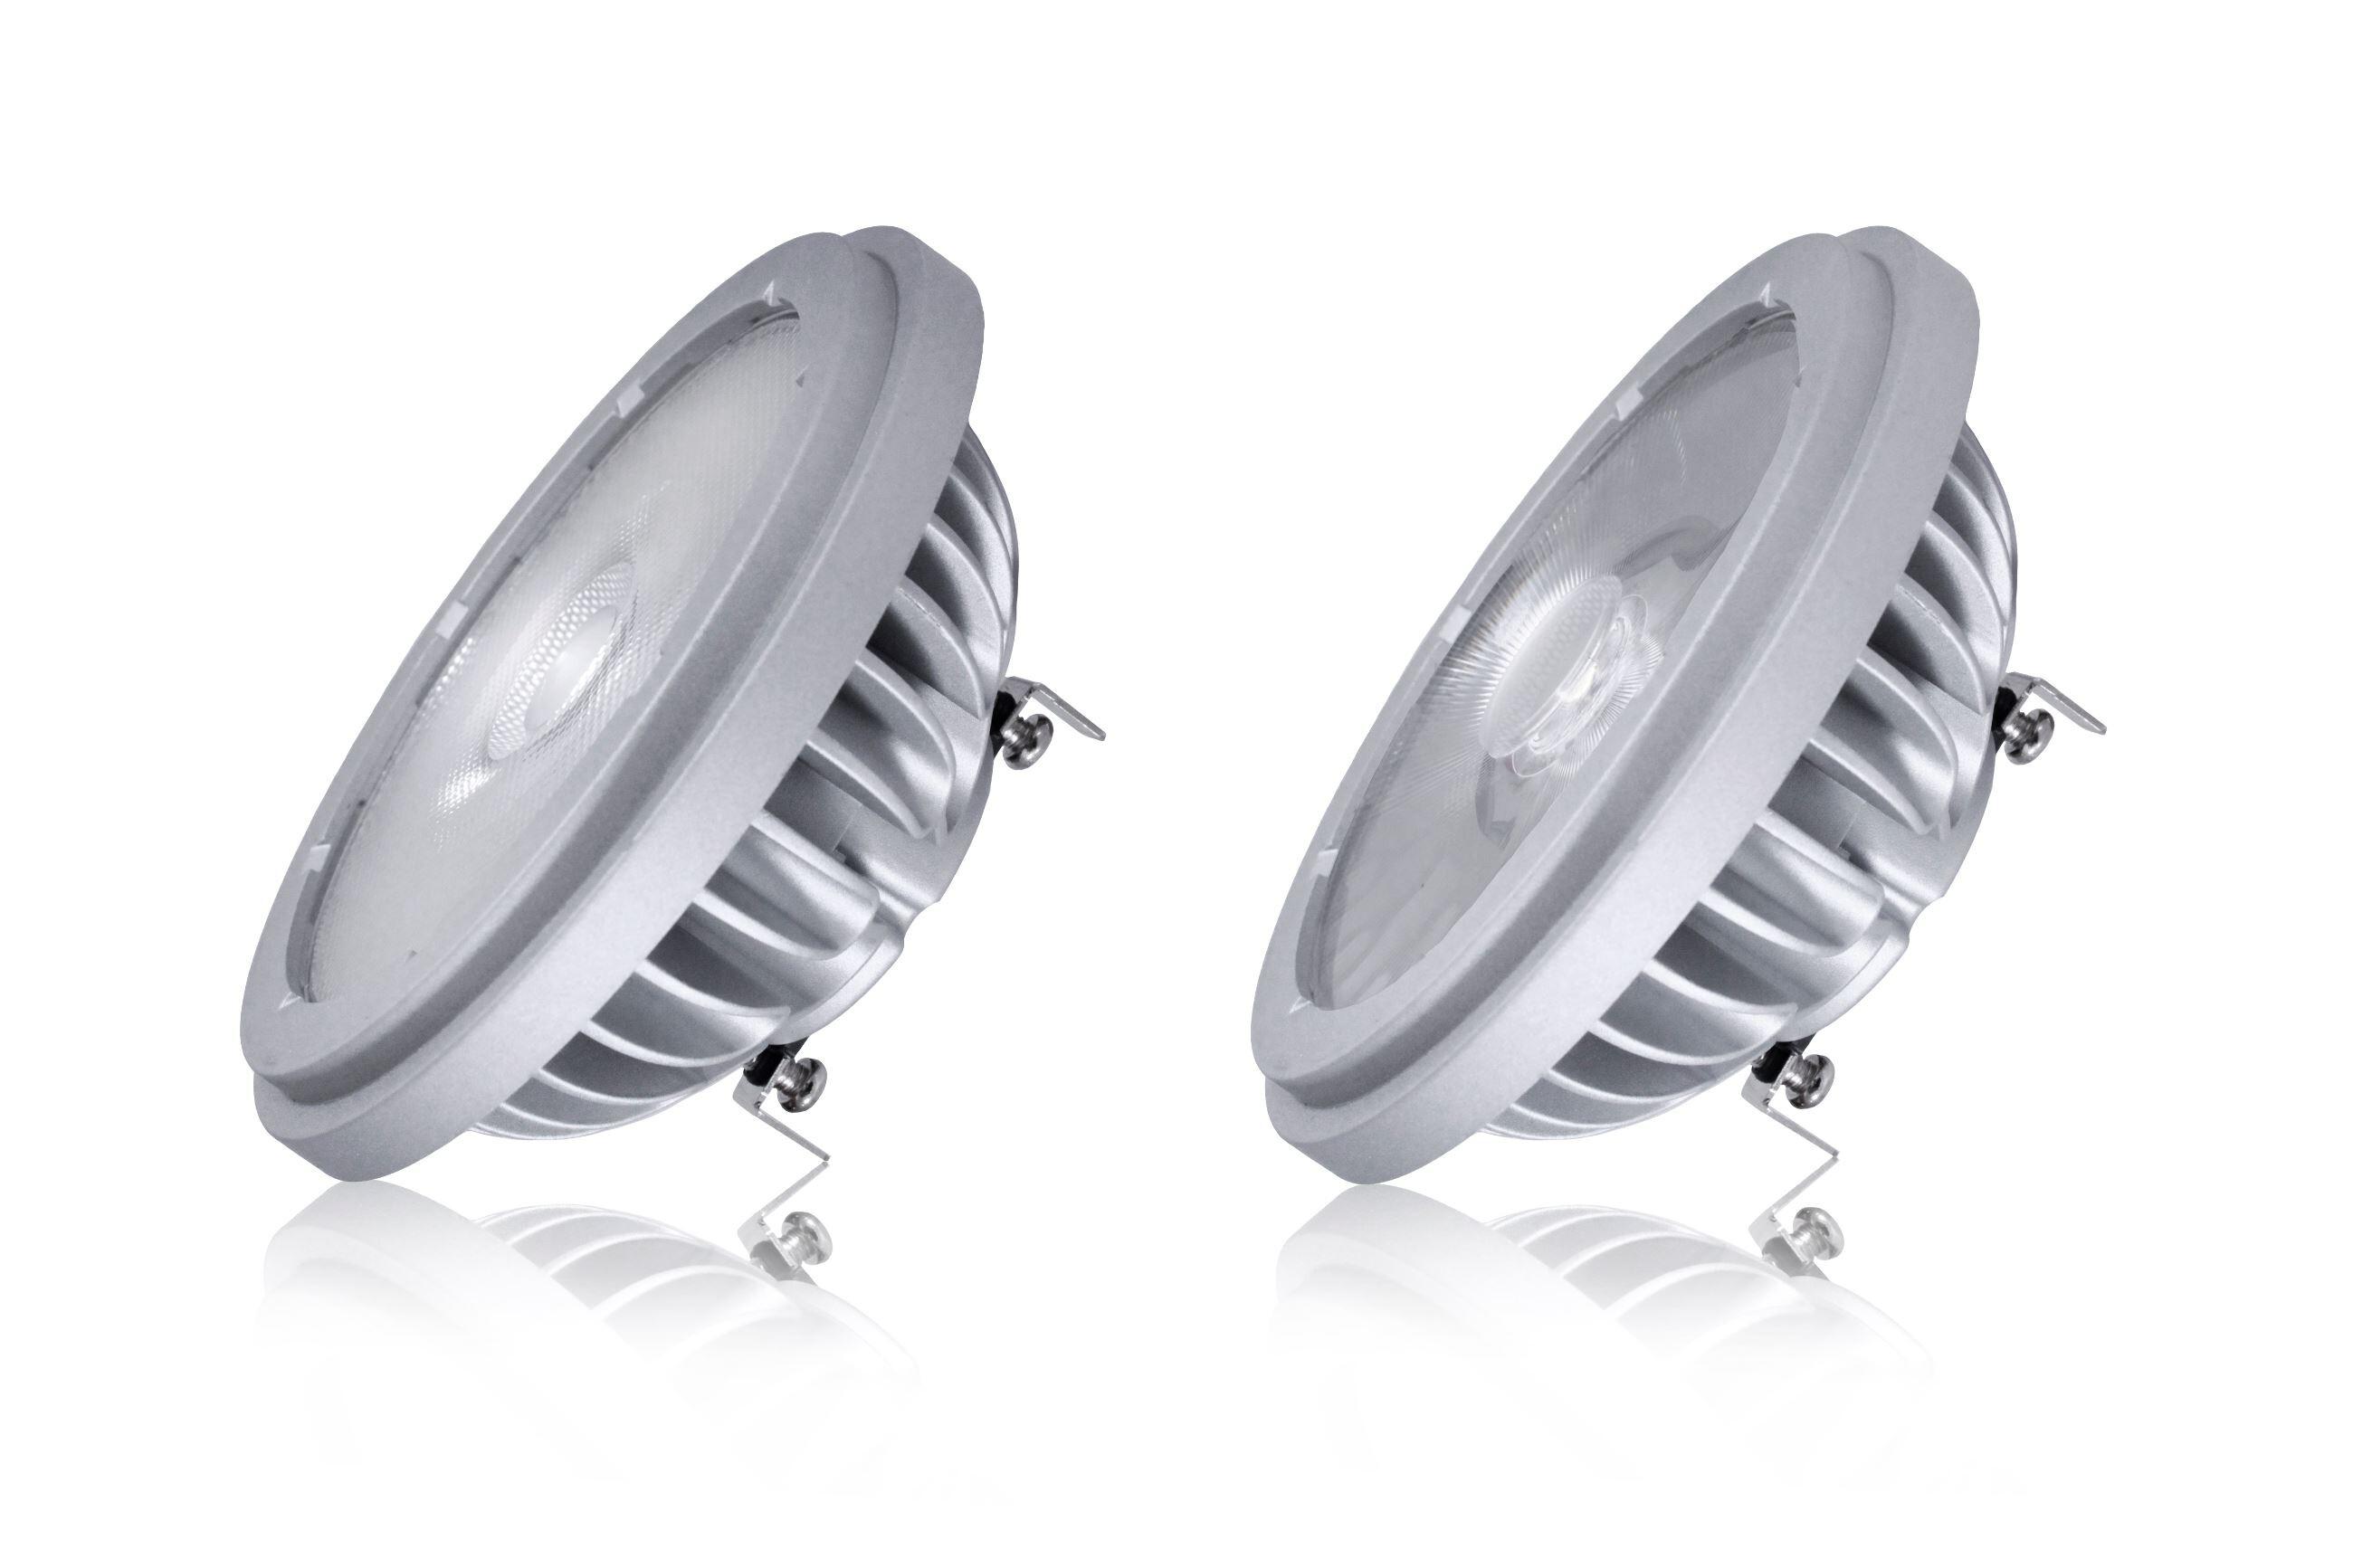 Soraa AR111 LED Lamp